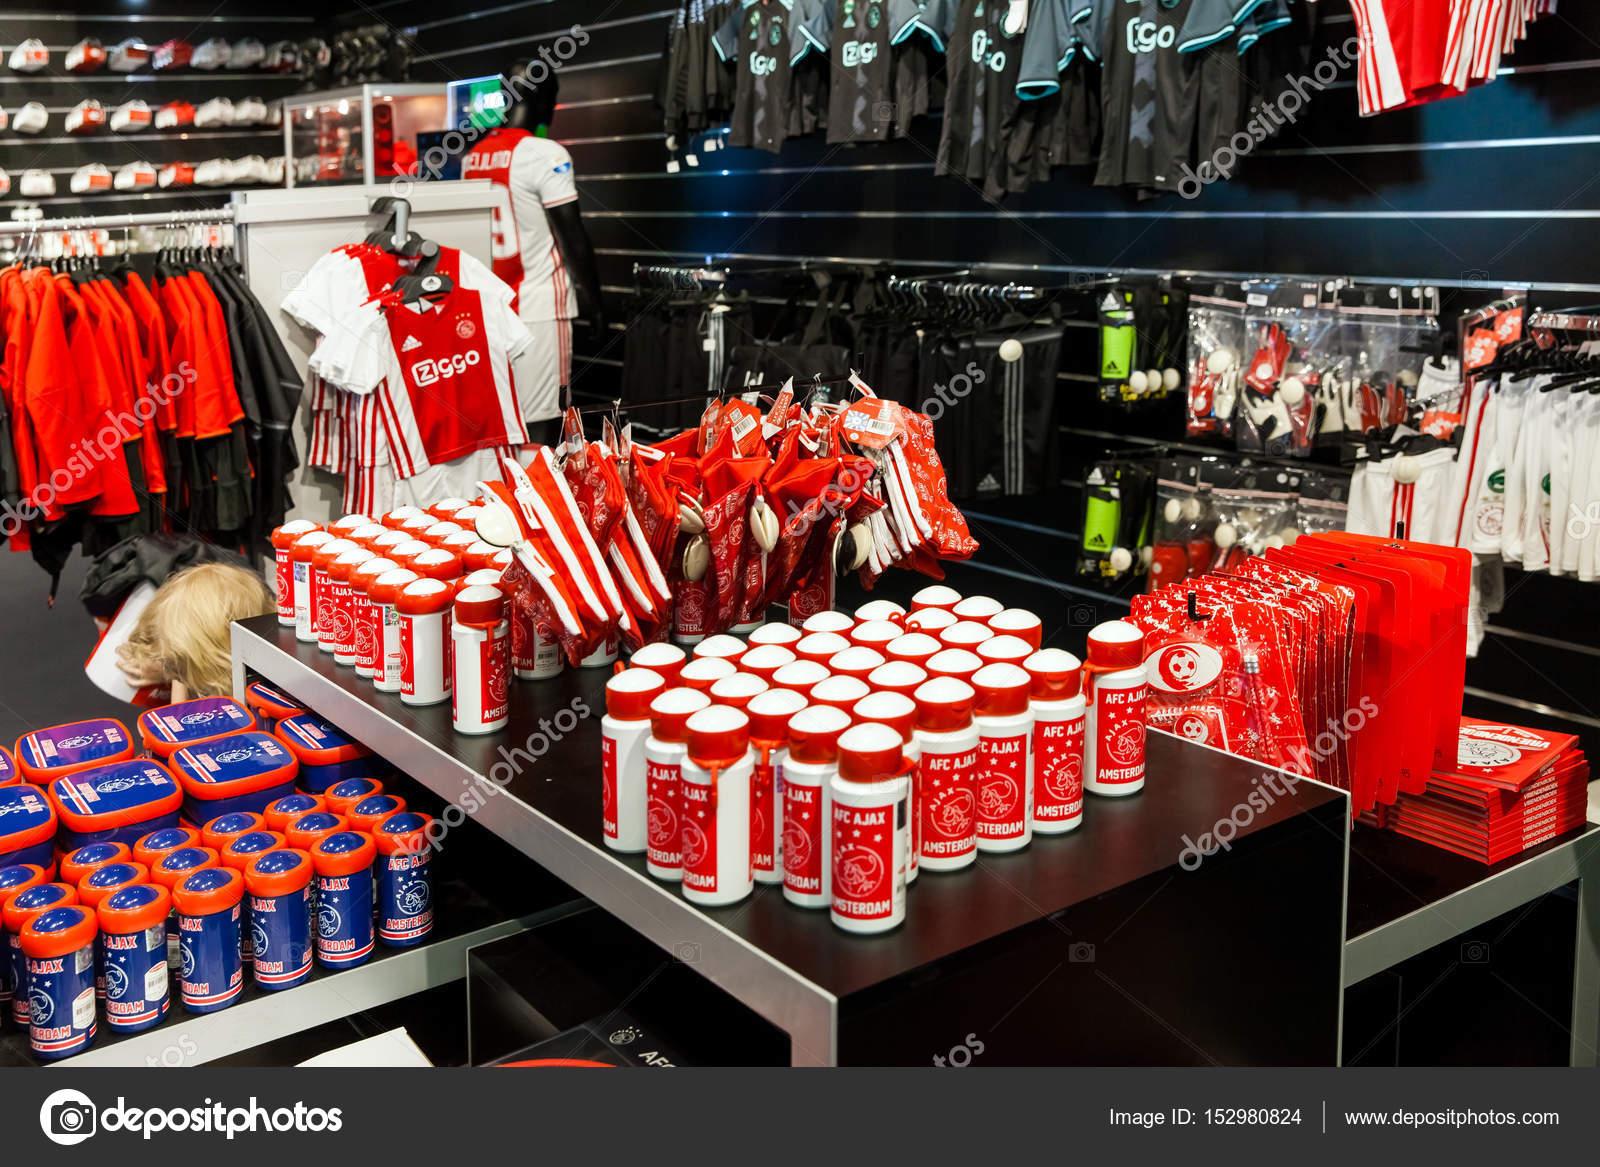 Ajax fotball club winkel interieur op Amsterdam Arena, Nederland ...